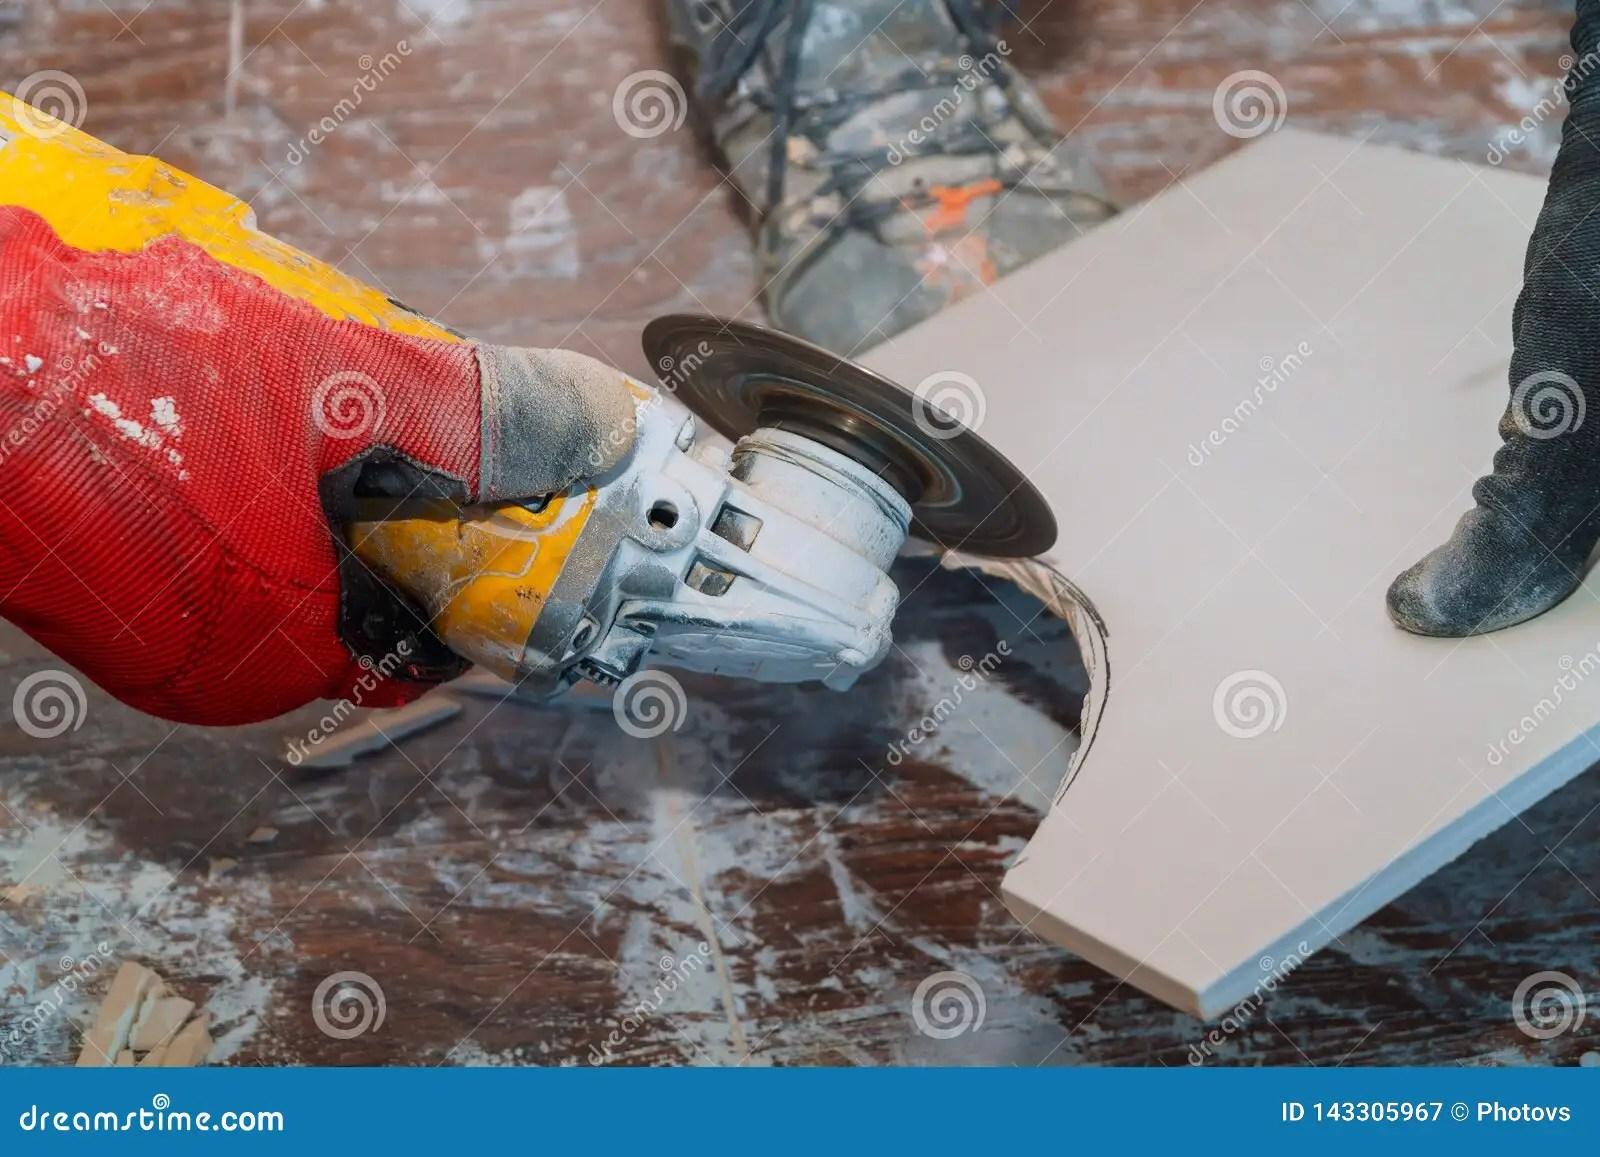 https www dreamstime com man worker cutting tile circular saw using grinder image143305967